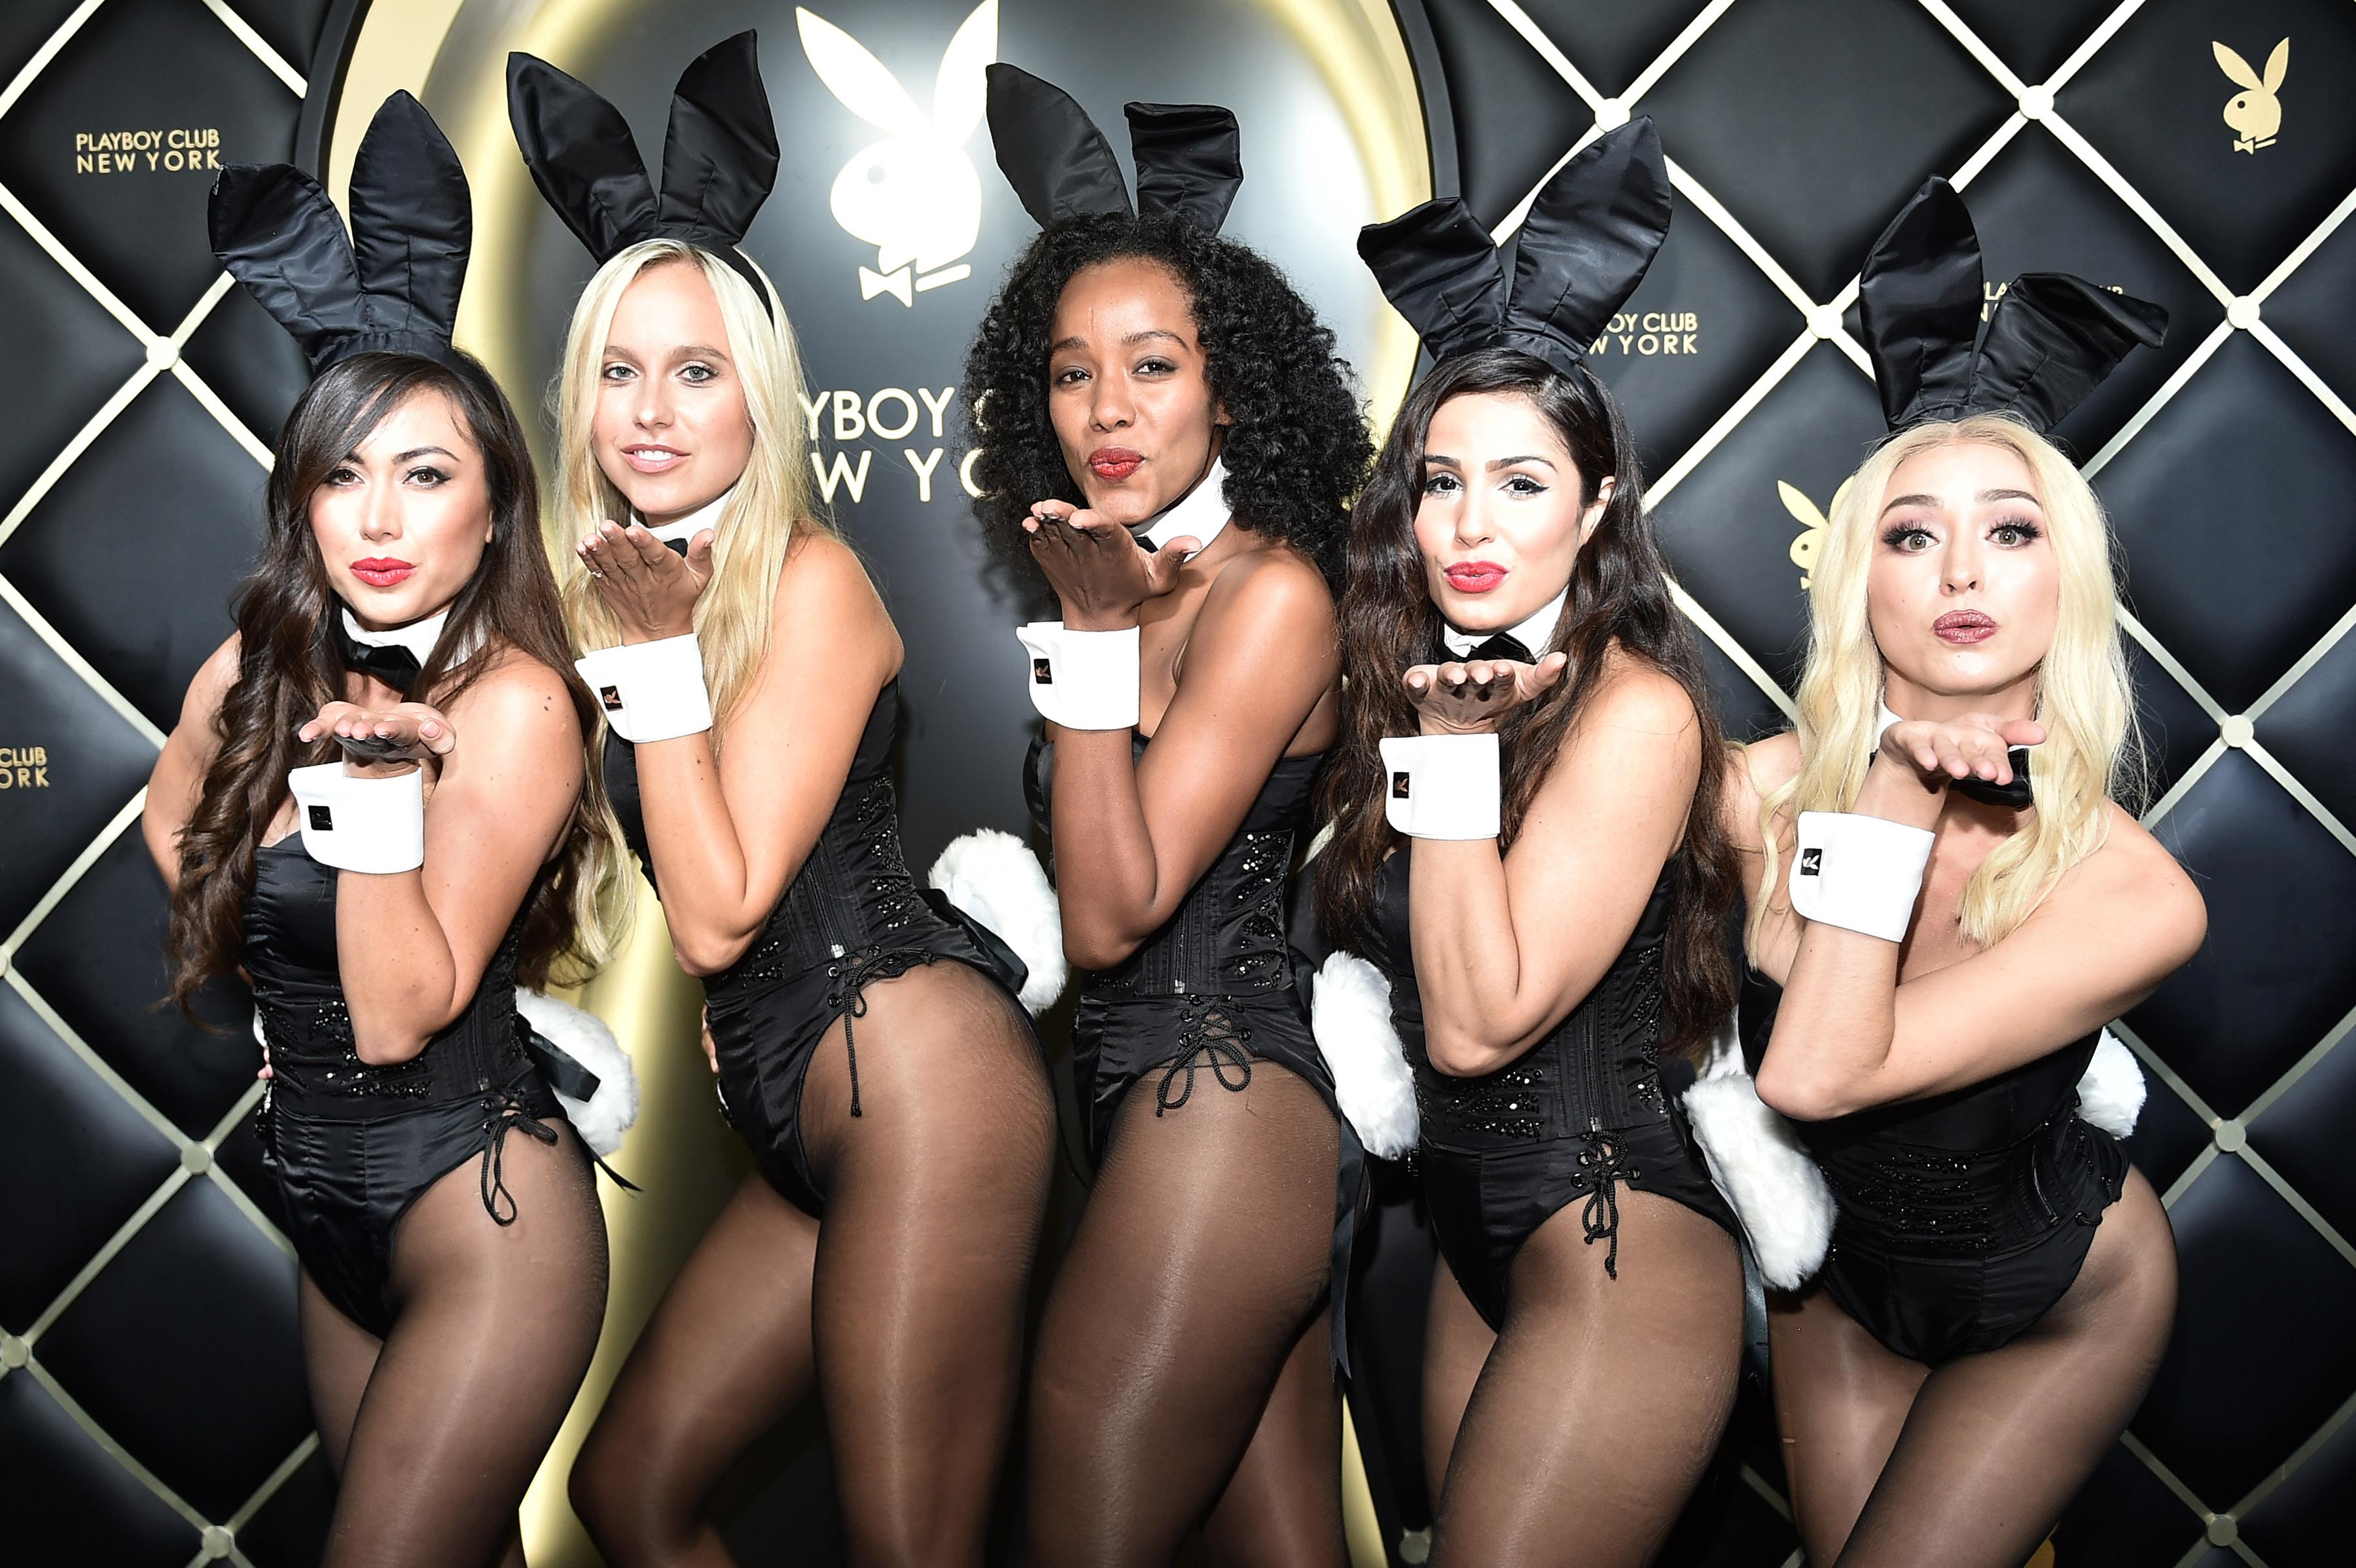 Playboy Club New York Grand Opening